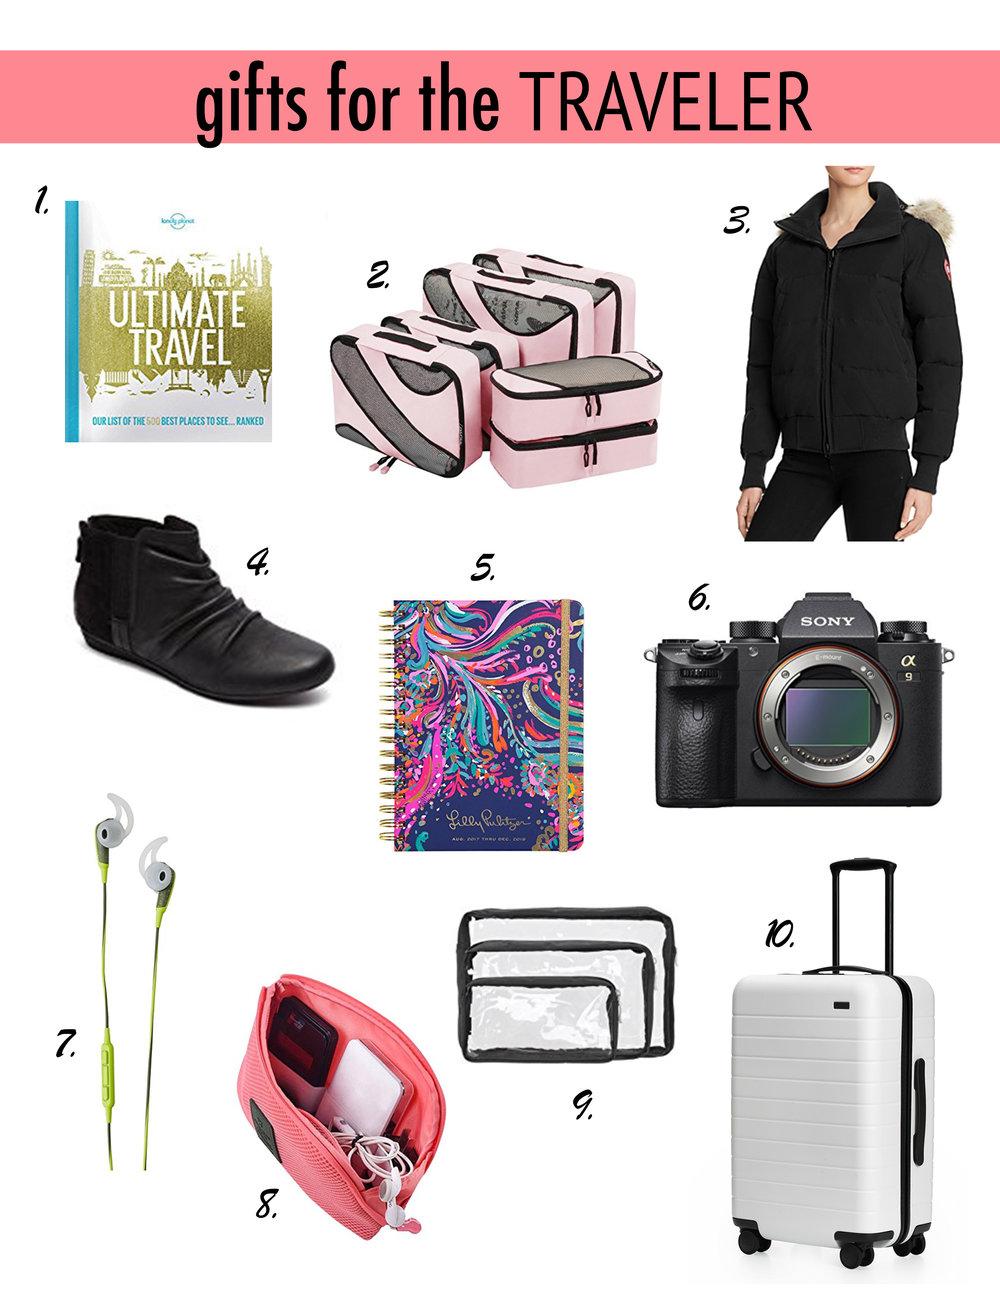 Holiday Gift Guide for the TRAVELER - NinaTekwani.com